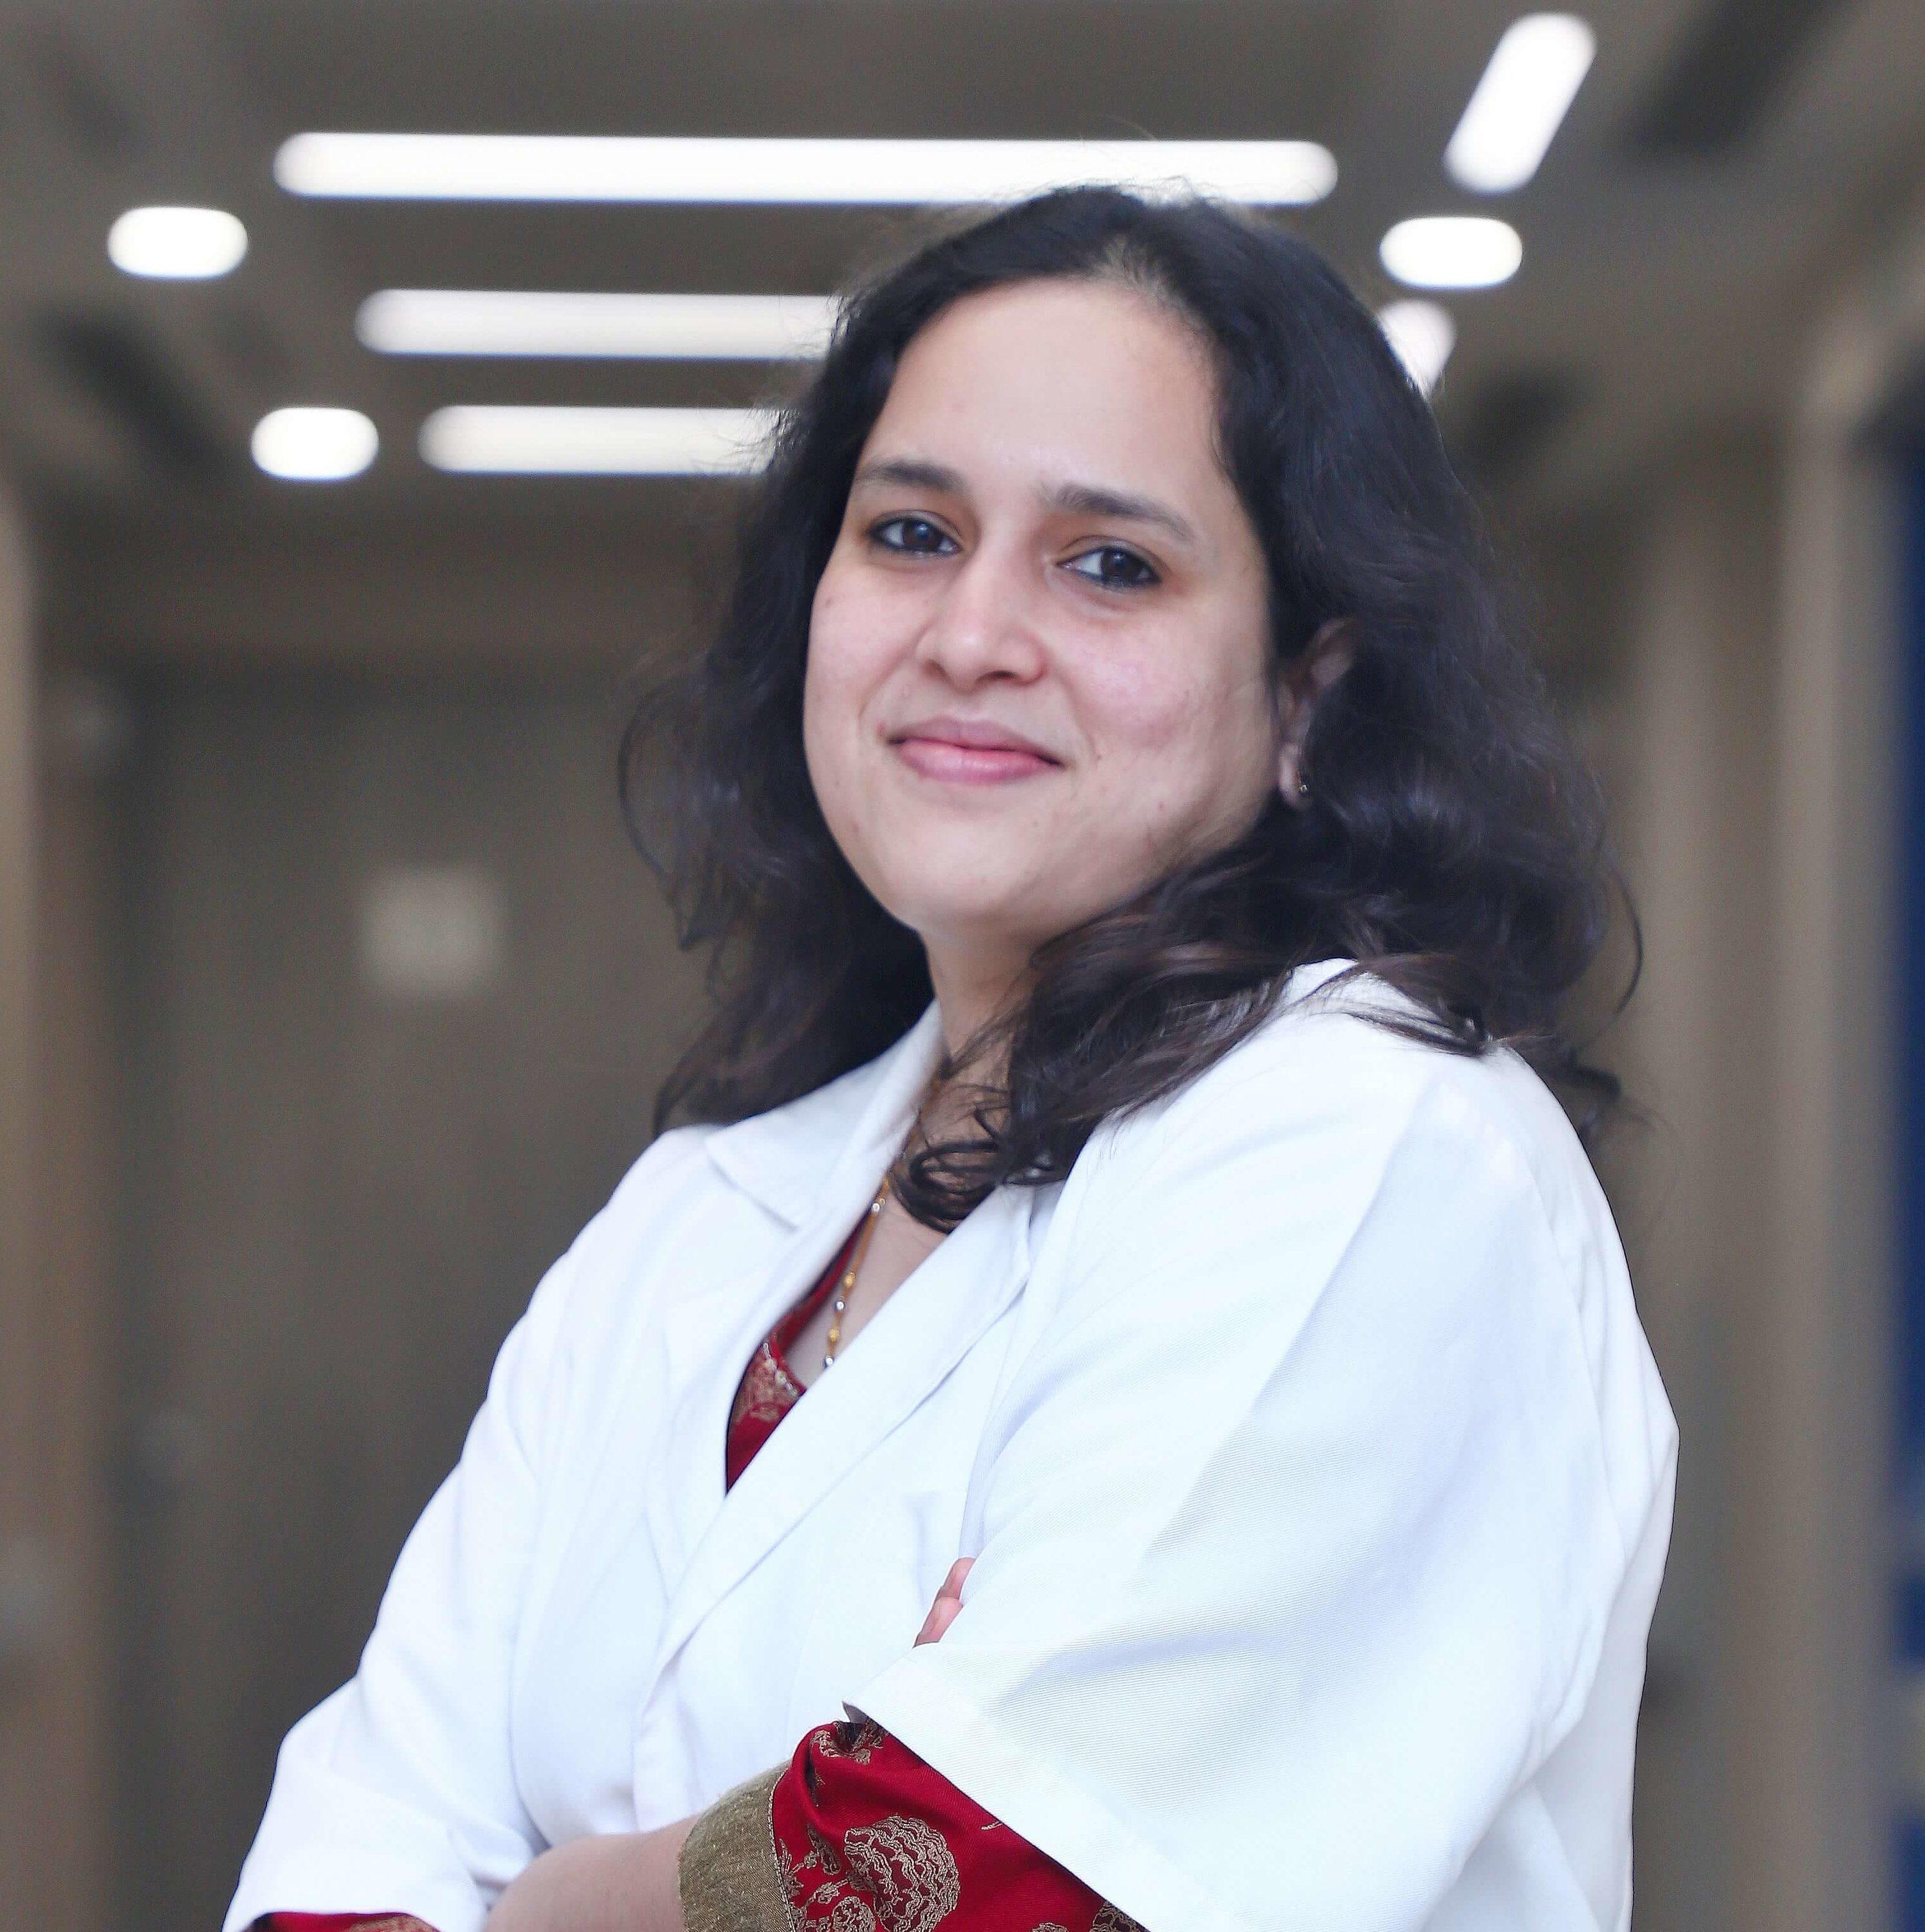 Dr. Prachi Benara, IVF specialist in Gurgaon